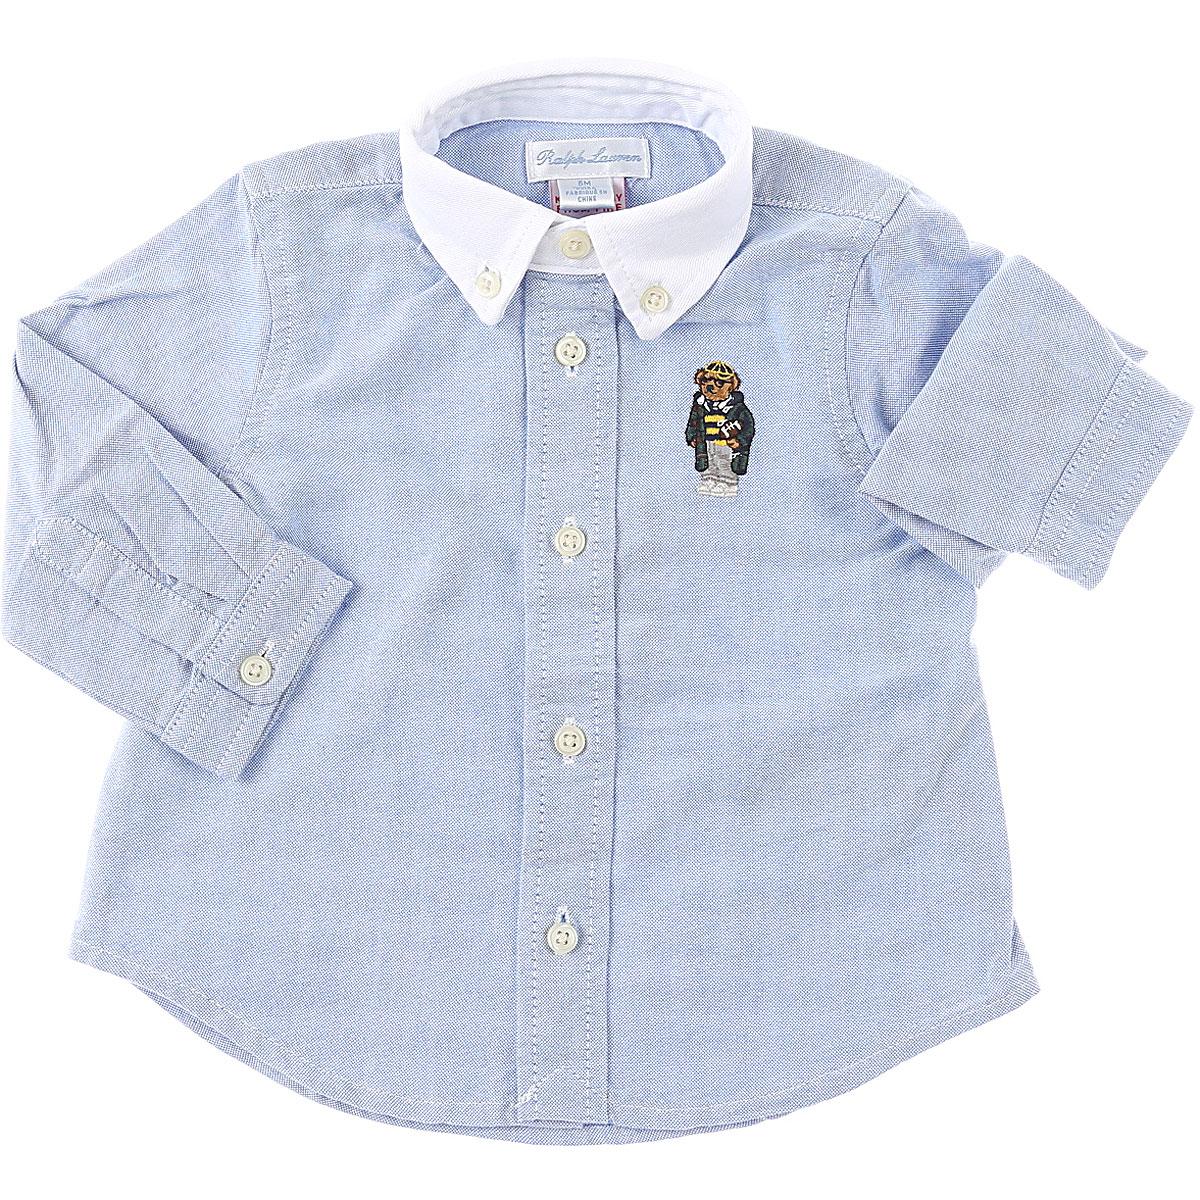 Ralph Lauren Baby Shirts for Boys On Sale, Sky, Cotton, 2019, 12 M 18M 6M